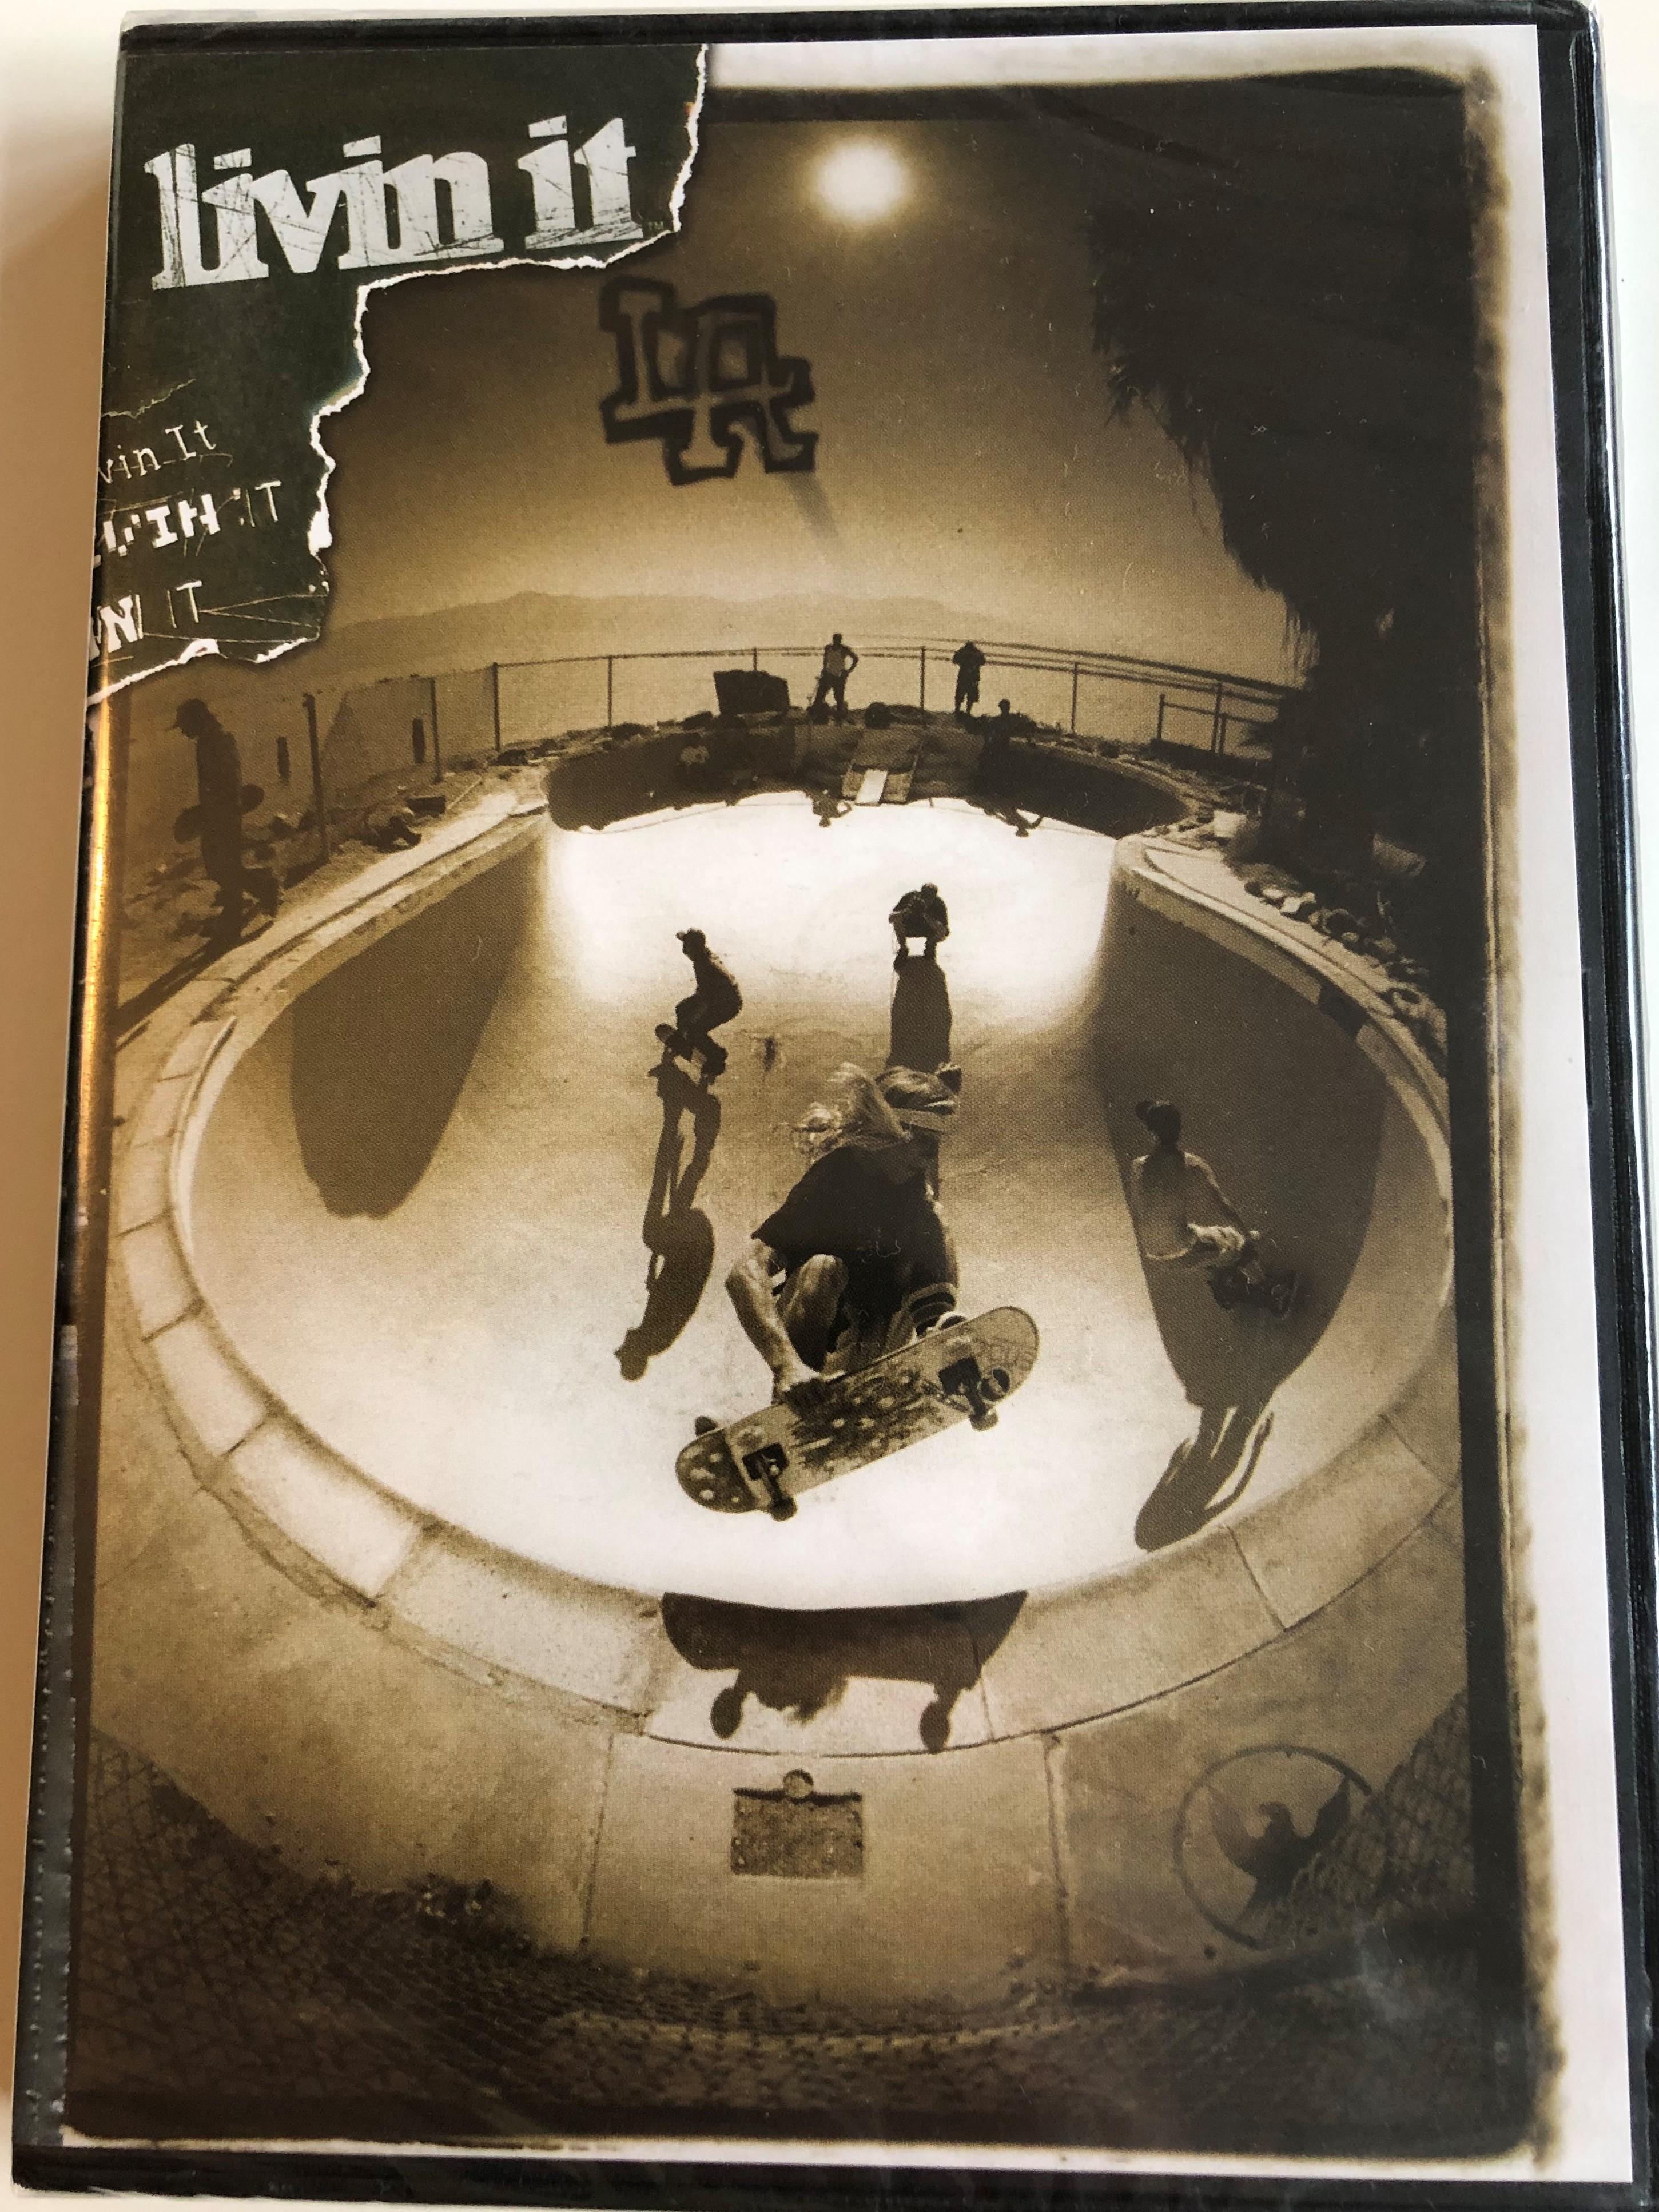 livin-it-la-dvd-2006-directed-by-stephen-baldwin-starring-christian-hosoi-donny-barley-richard-mulder-josh-kasper-lance-mountain-brian-sumner-elijah-moore-skateboarding-film-1-.jpg